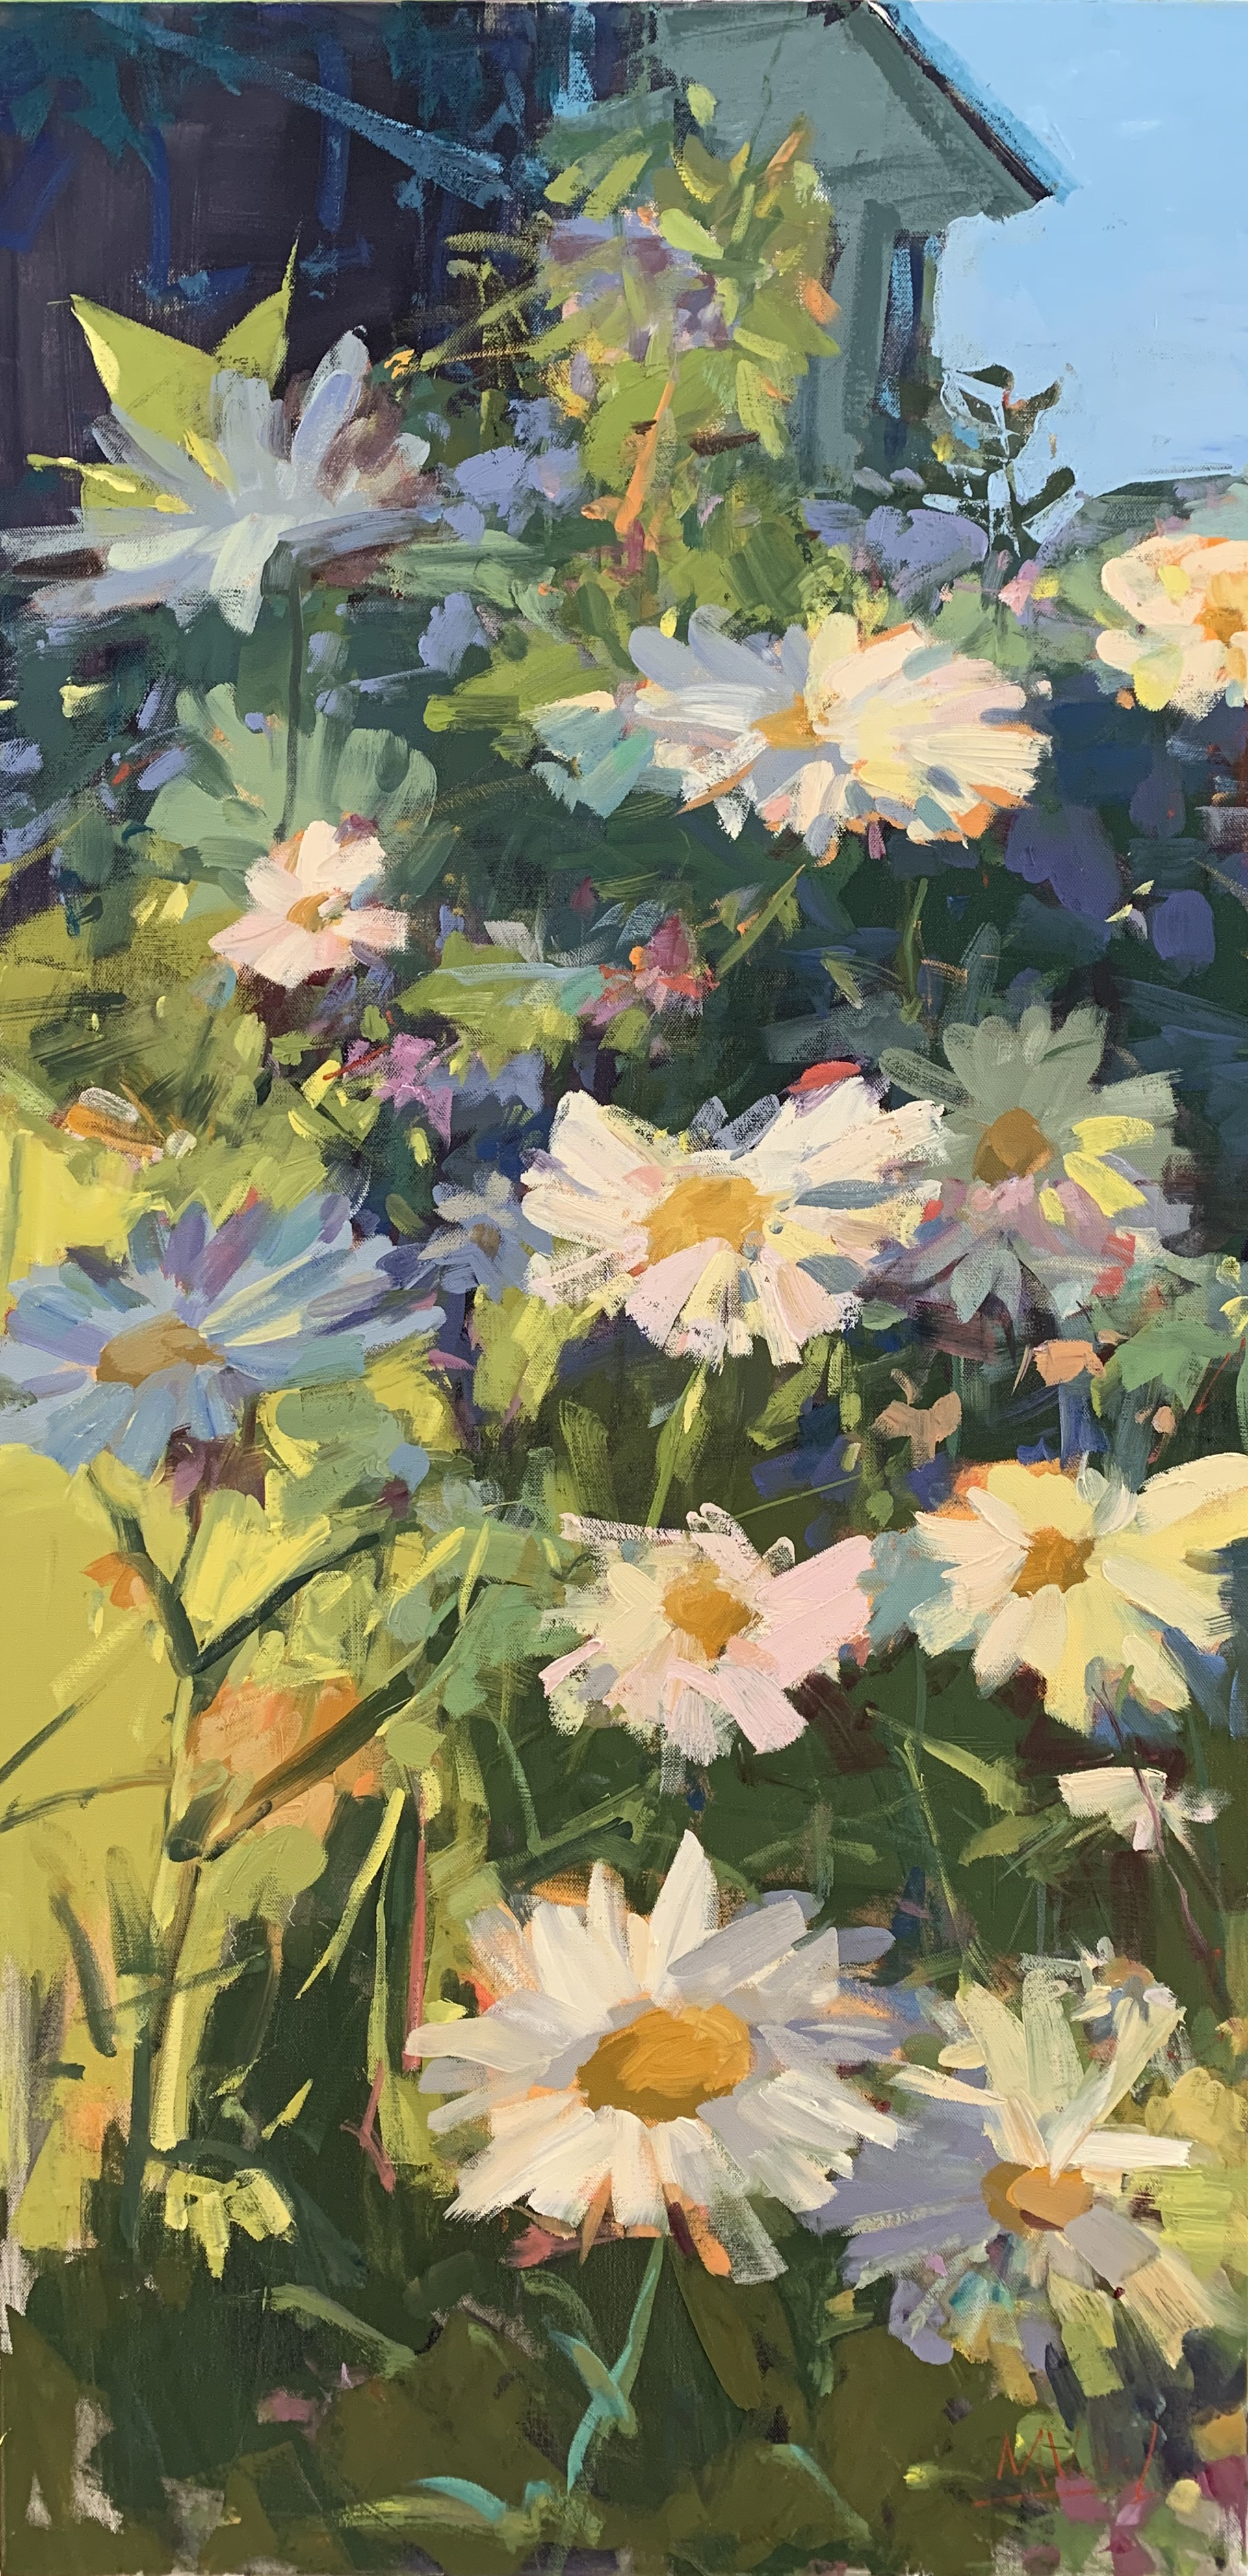 Just Lovely by Marissa Vogl